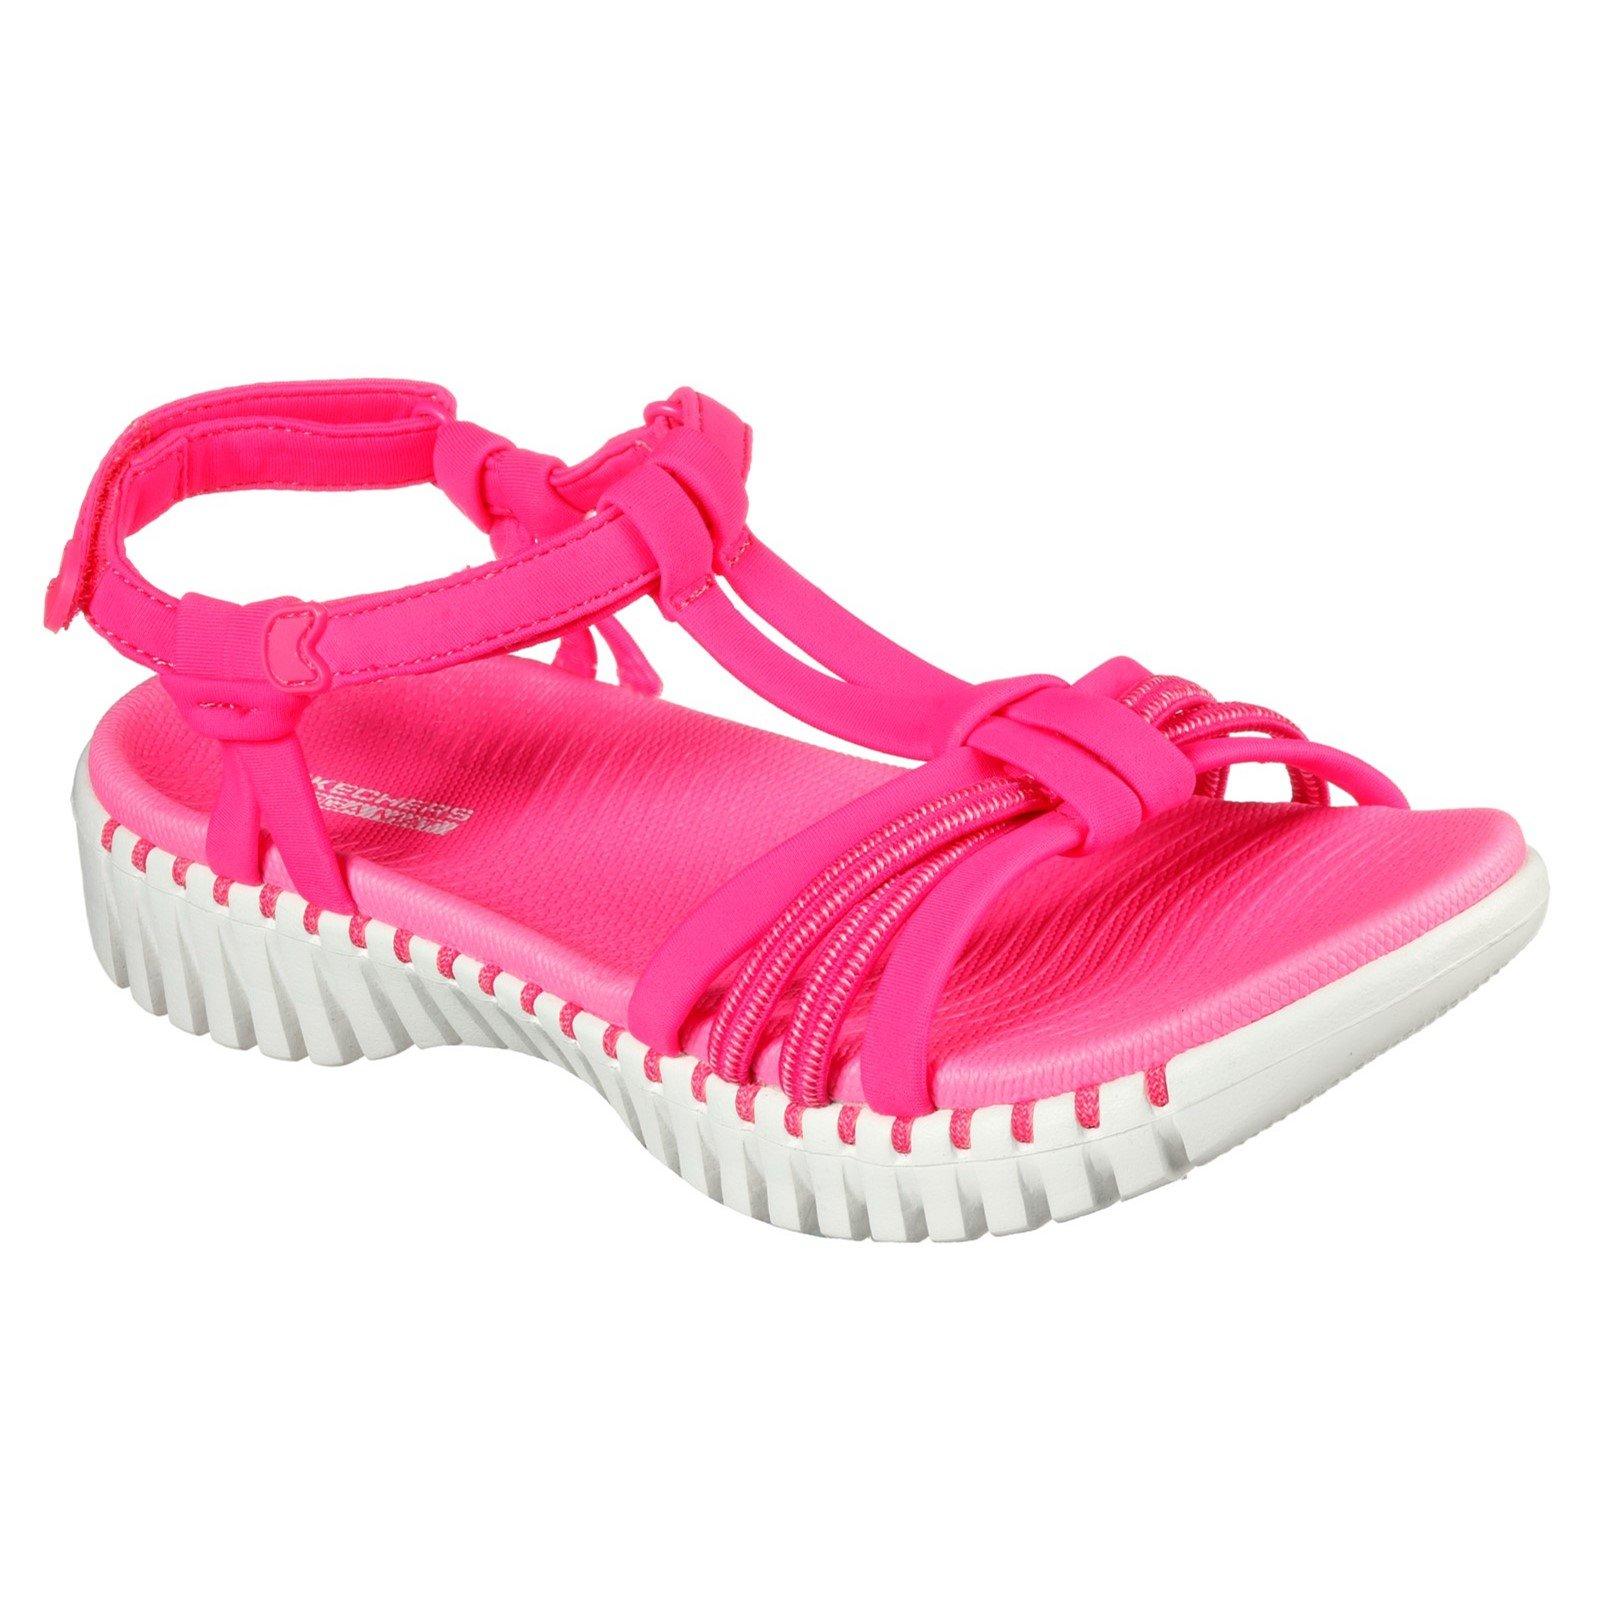 Skechers Women's Go Walk Smart Summer Sandal Various Colours 32156 - Pink 3